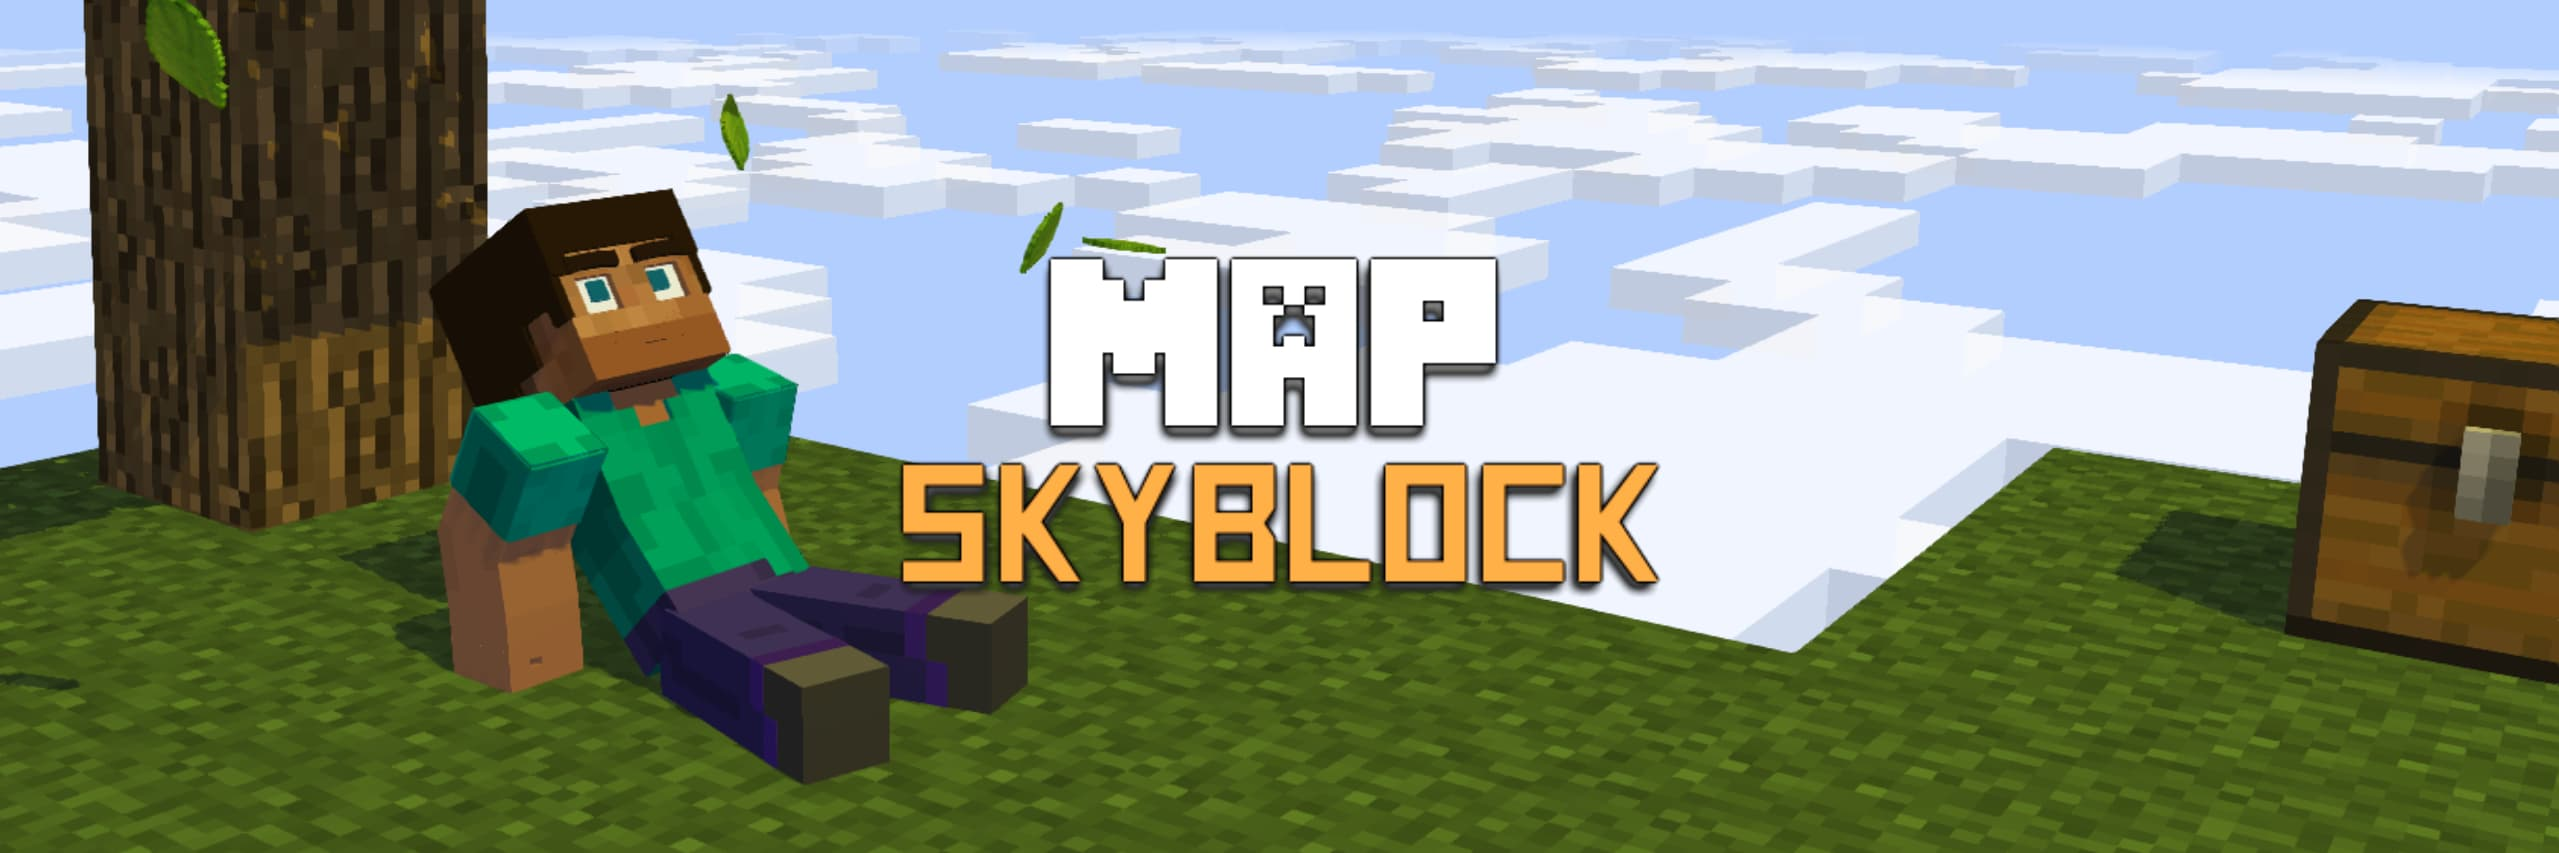 skyblock minecraft